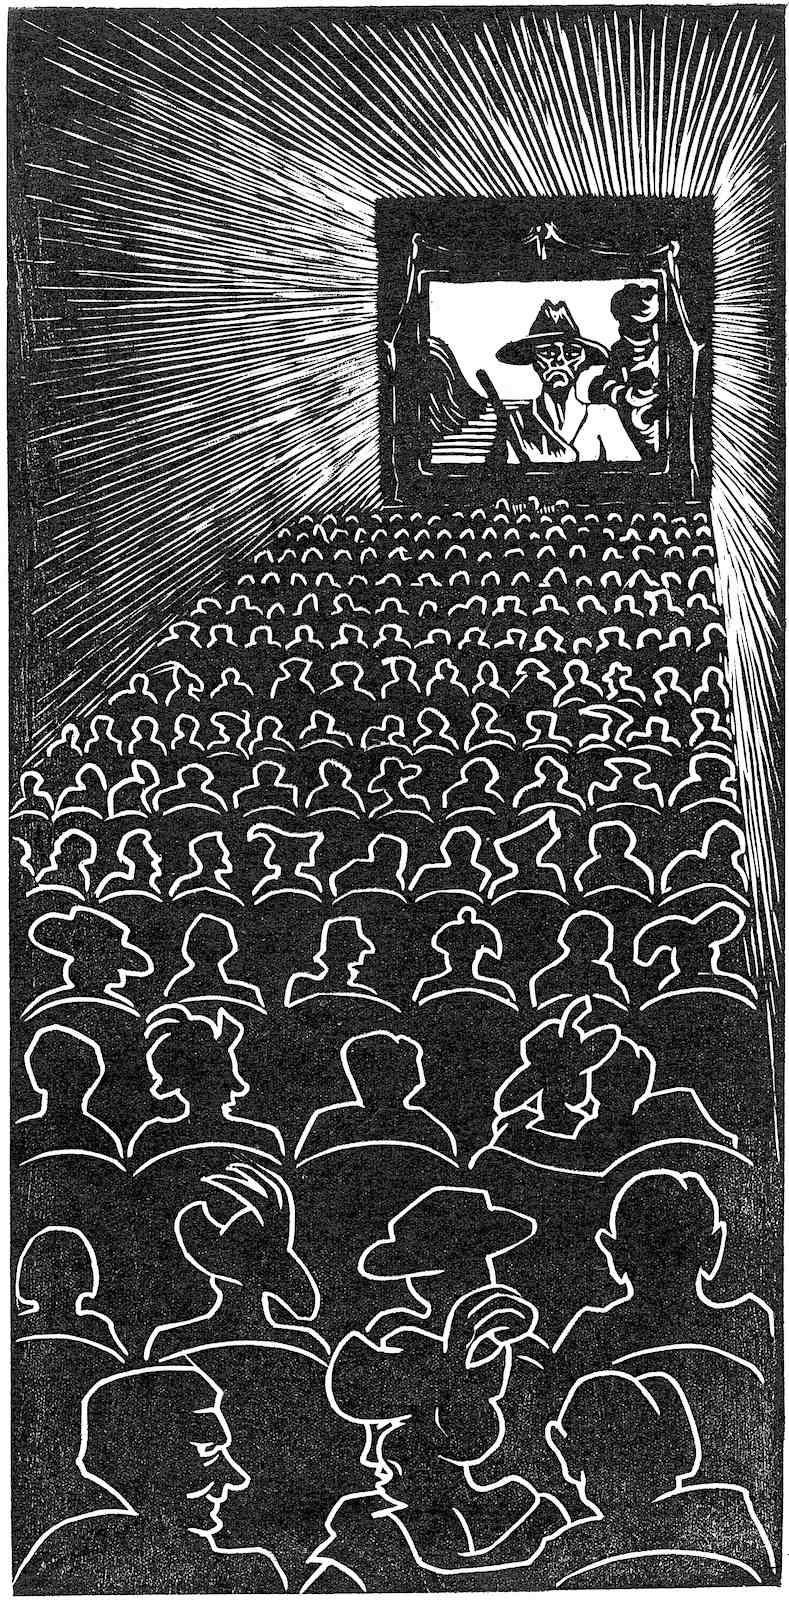 Maurits Cornelis Escher 1920, a cinema